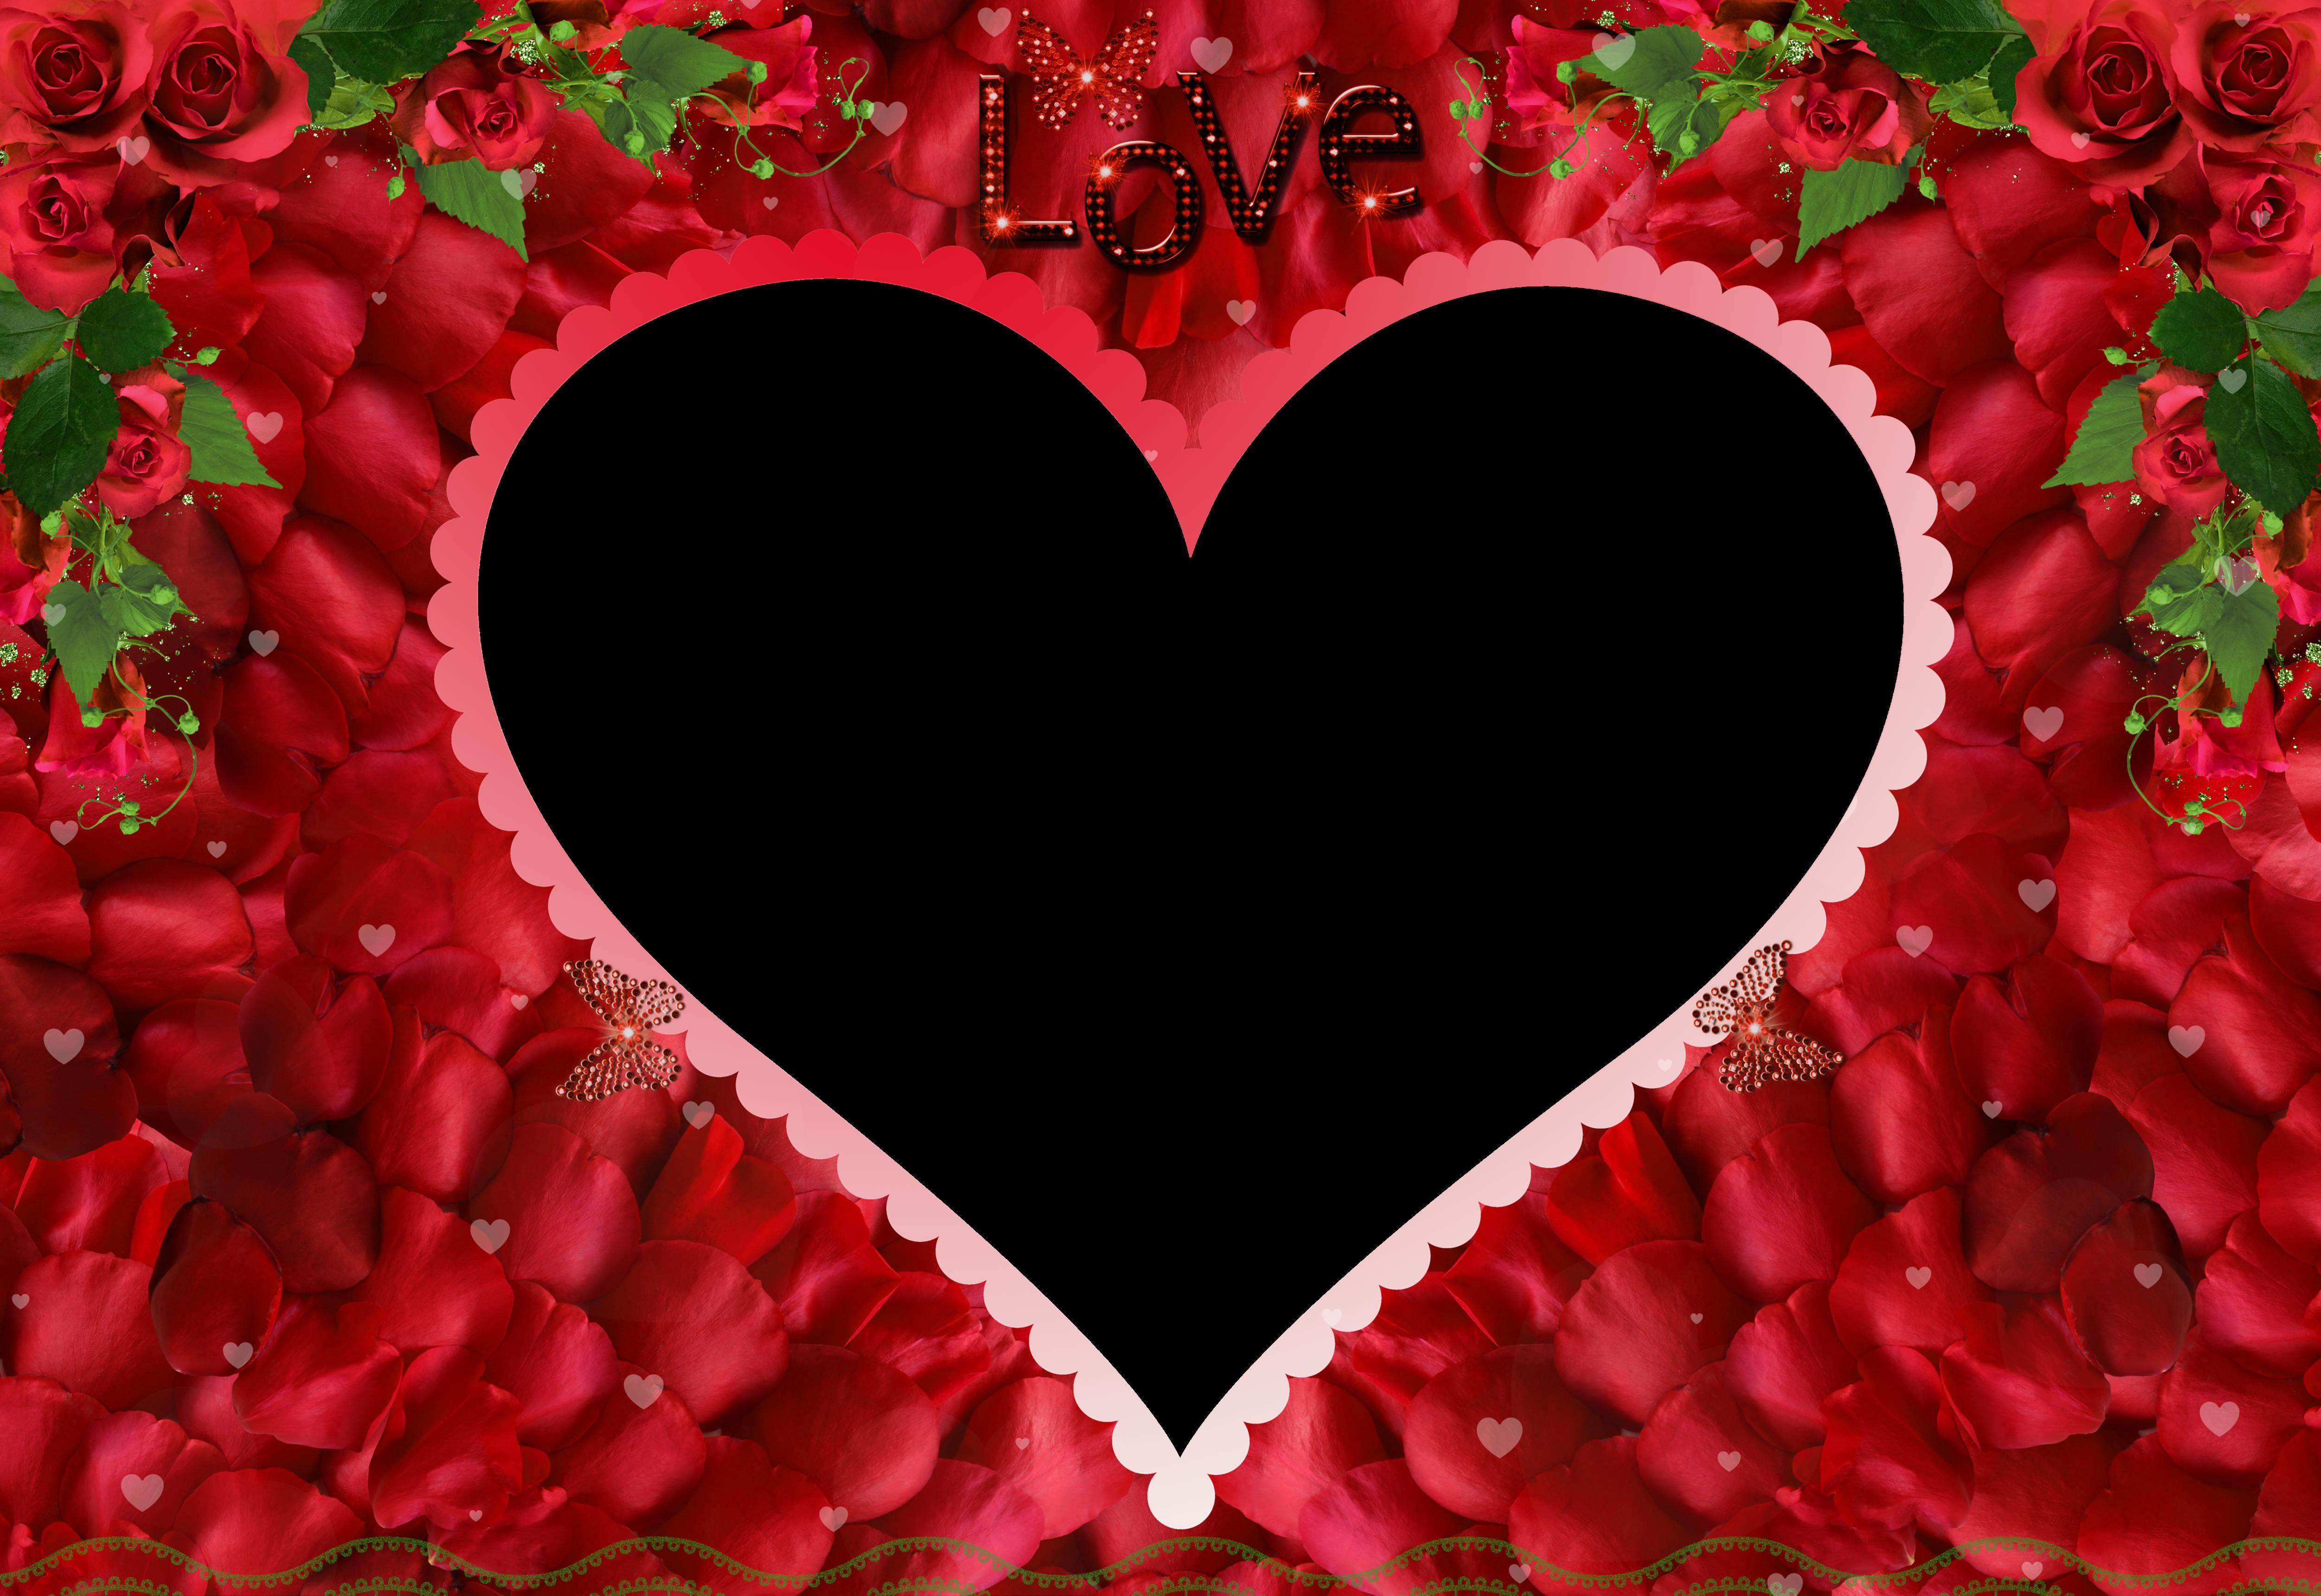 Love Rose Red Transparent PNG Photo Frame.